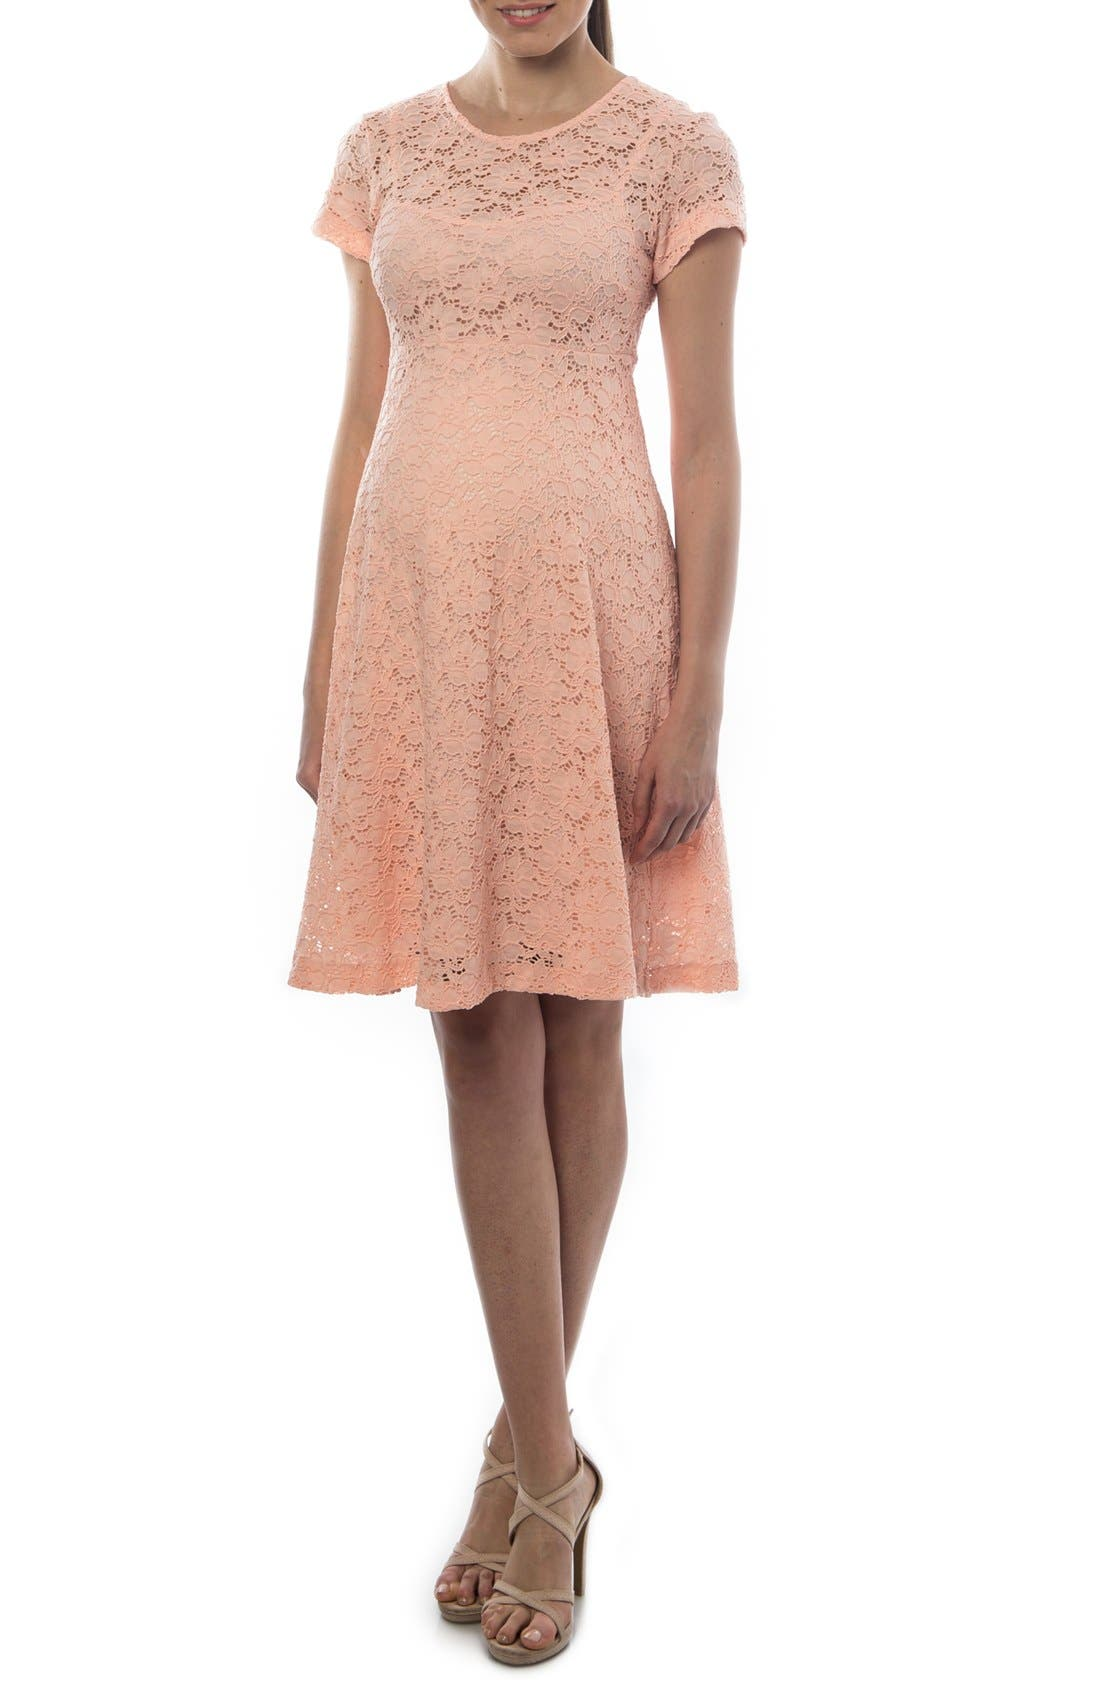 Main Image - PIETRO BRUNELLI 'Rodano' Lace Maternity Dress